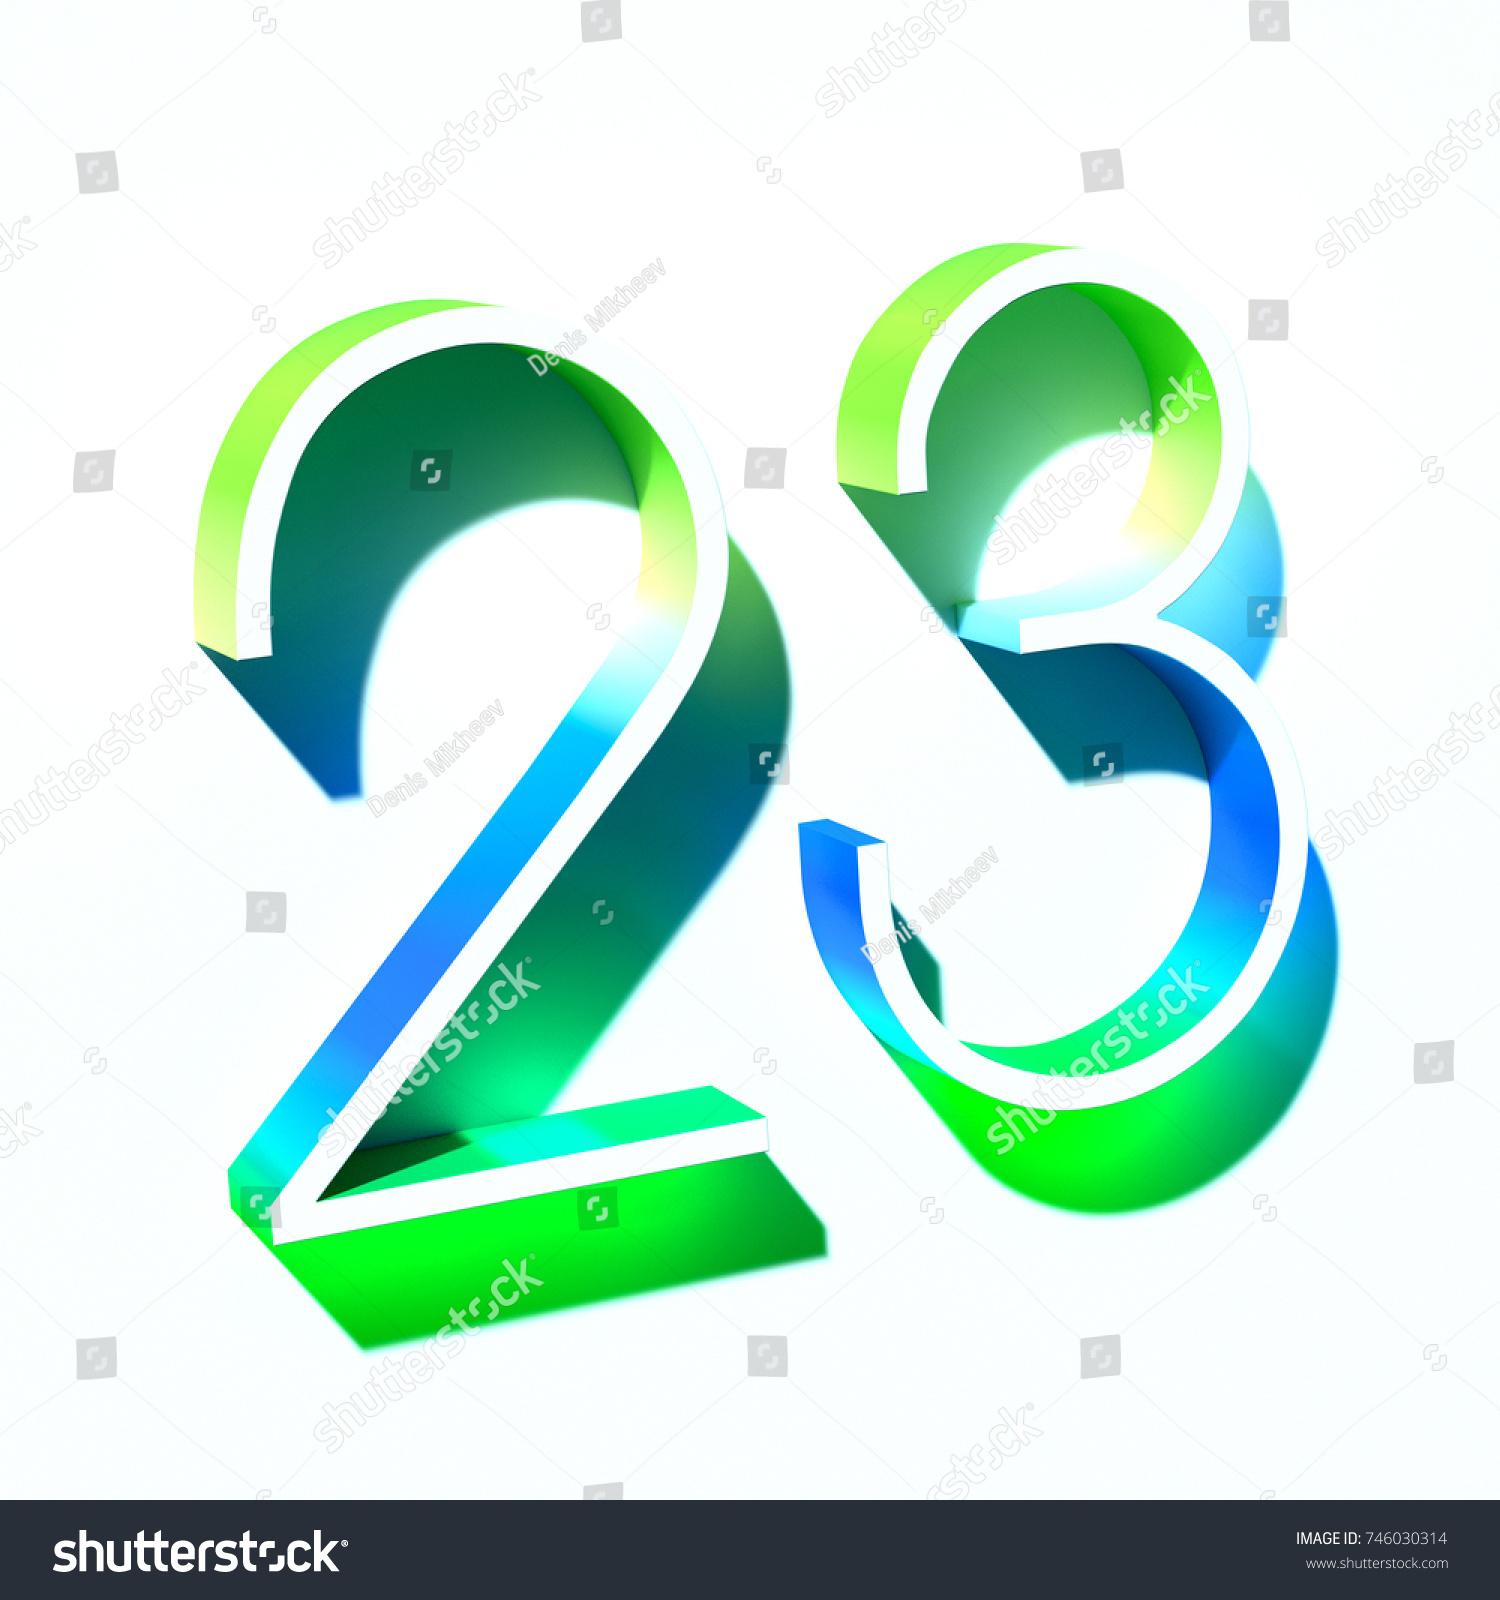 Number Twenty Three 23 Blue Green Stock Illustration 746030314 ...